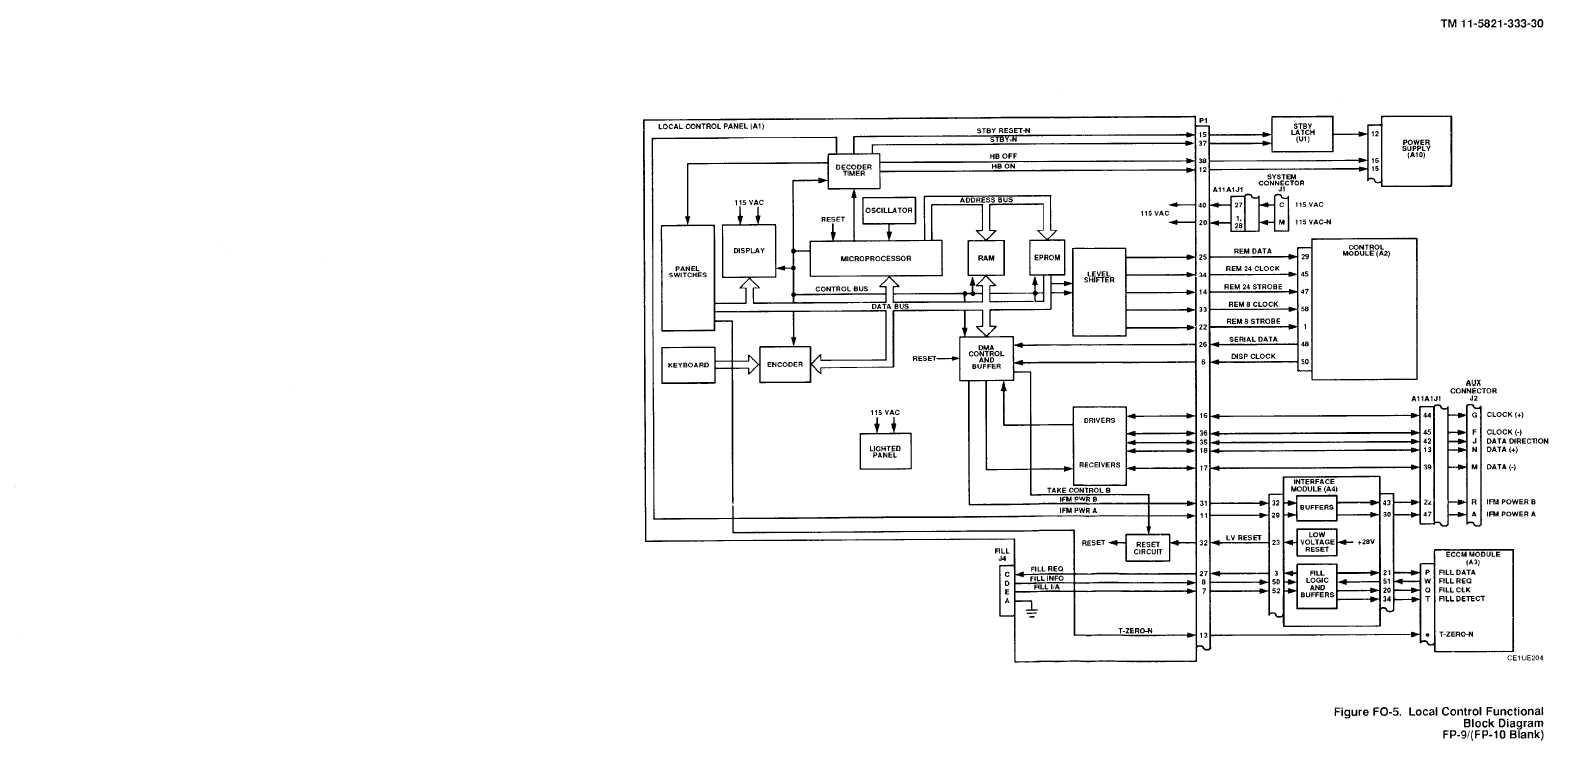 Figure FO-5. Local Control Functional Block Diagram